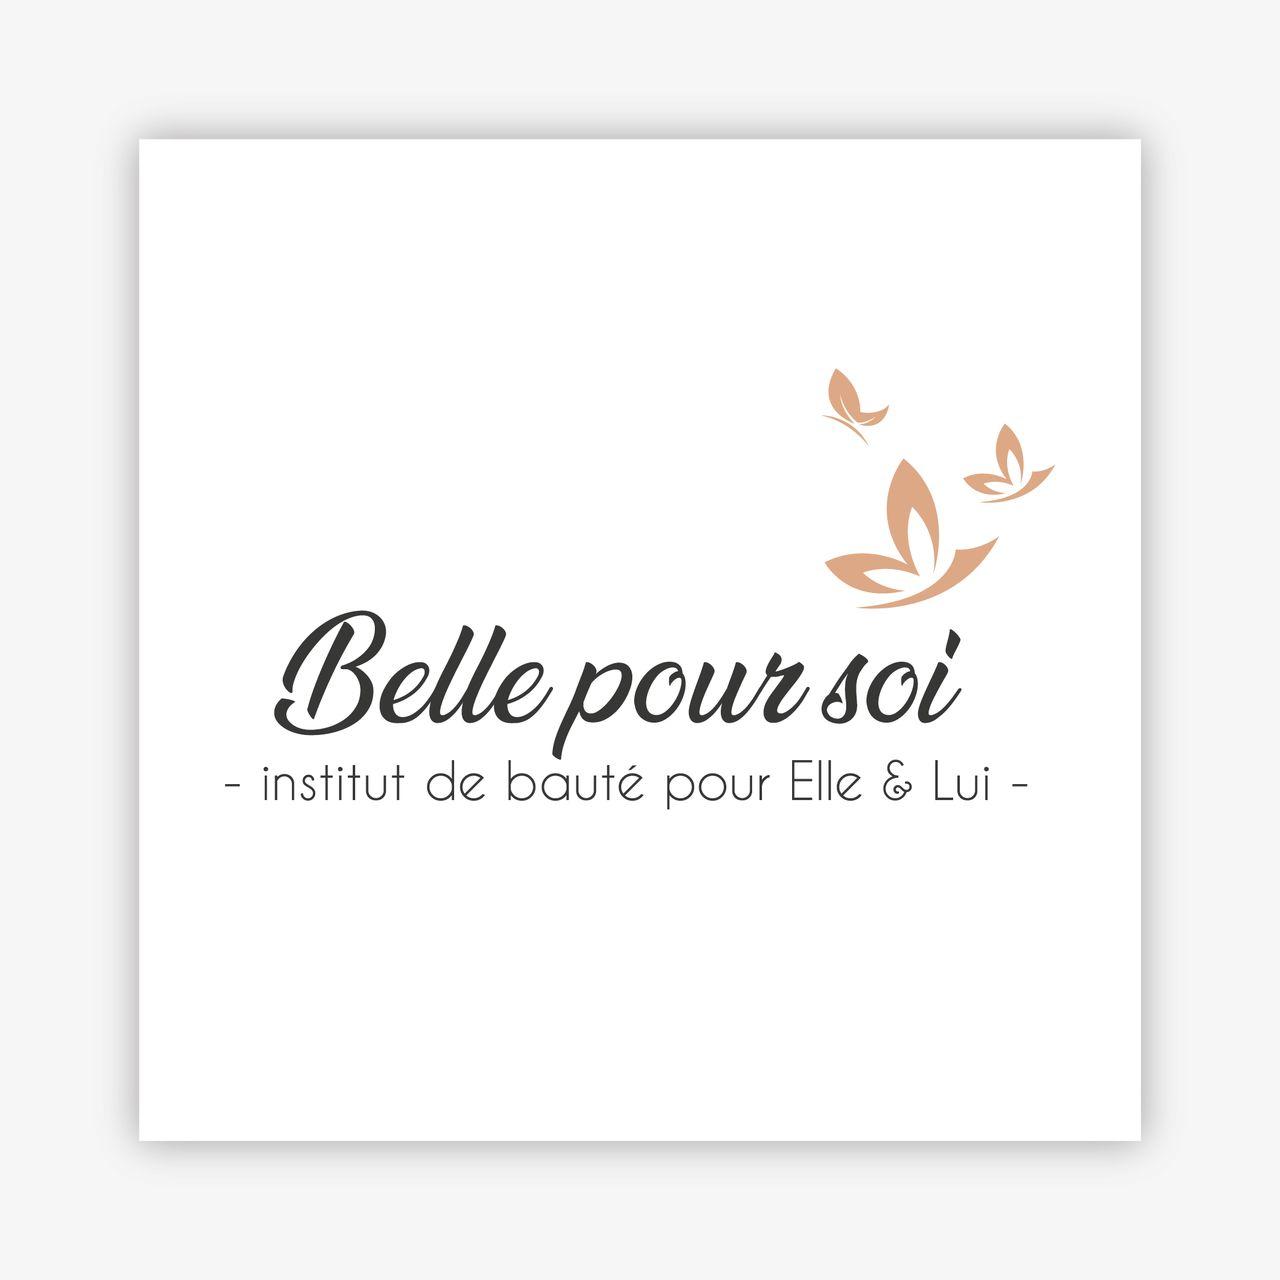 Logo Belle pour soi.